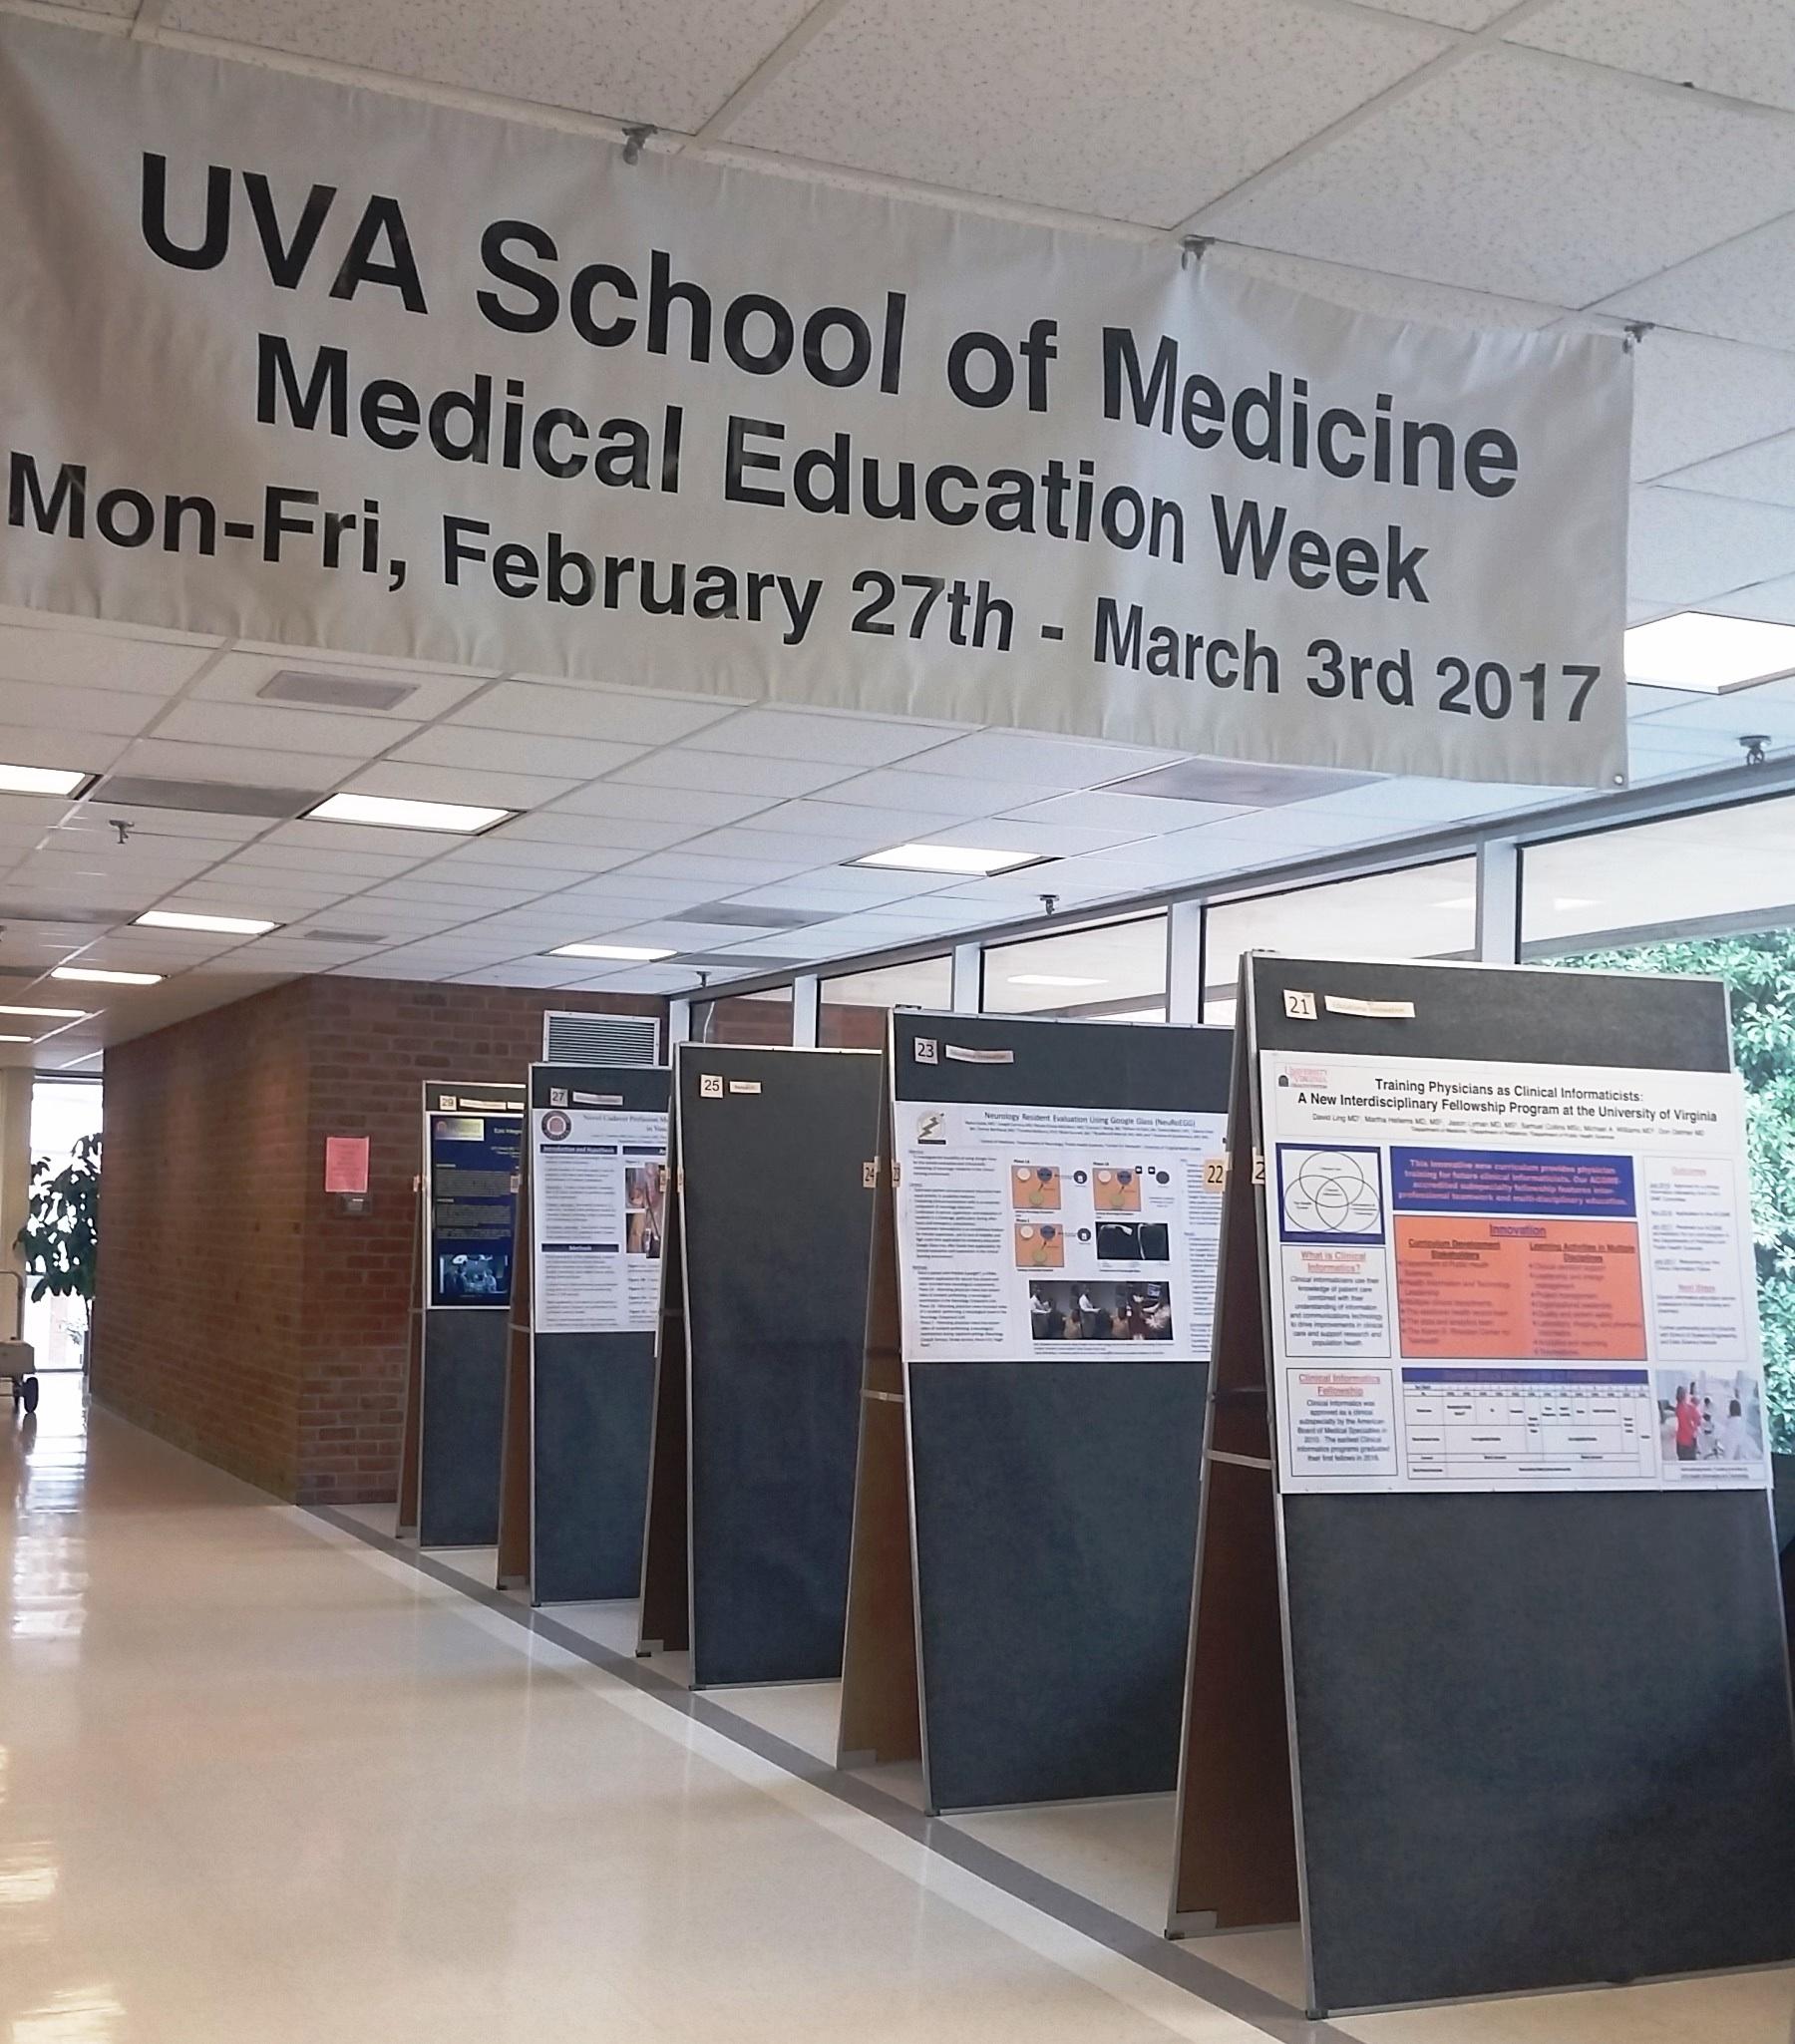 Medical Education Week 2018 - Faculty Development Blog